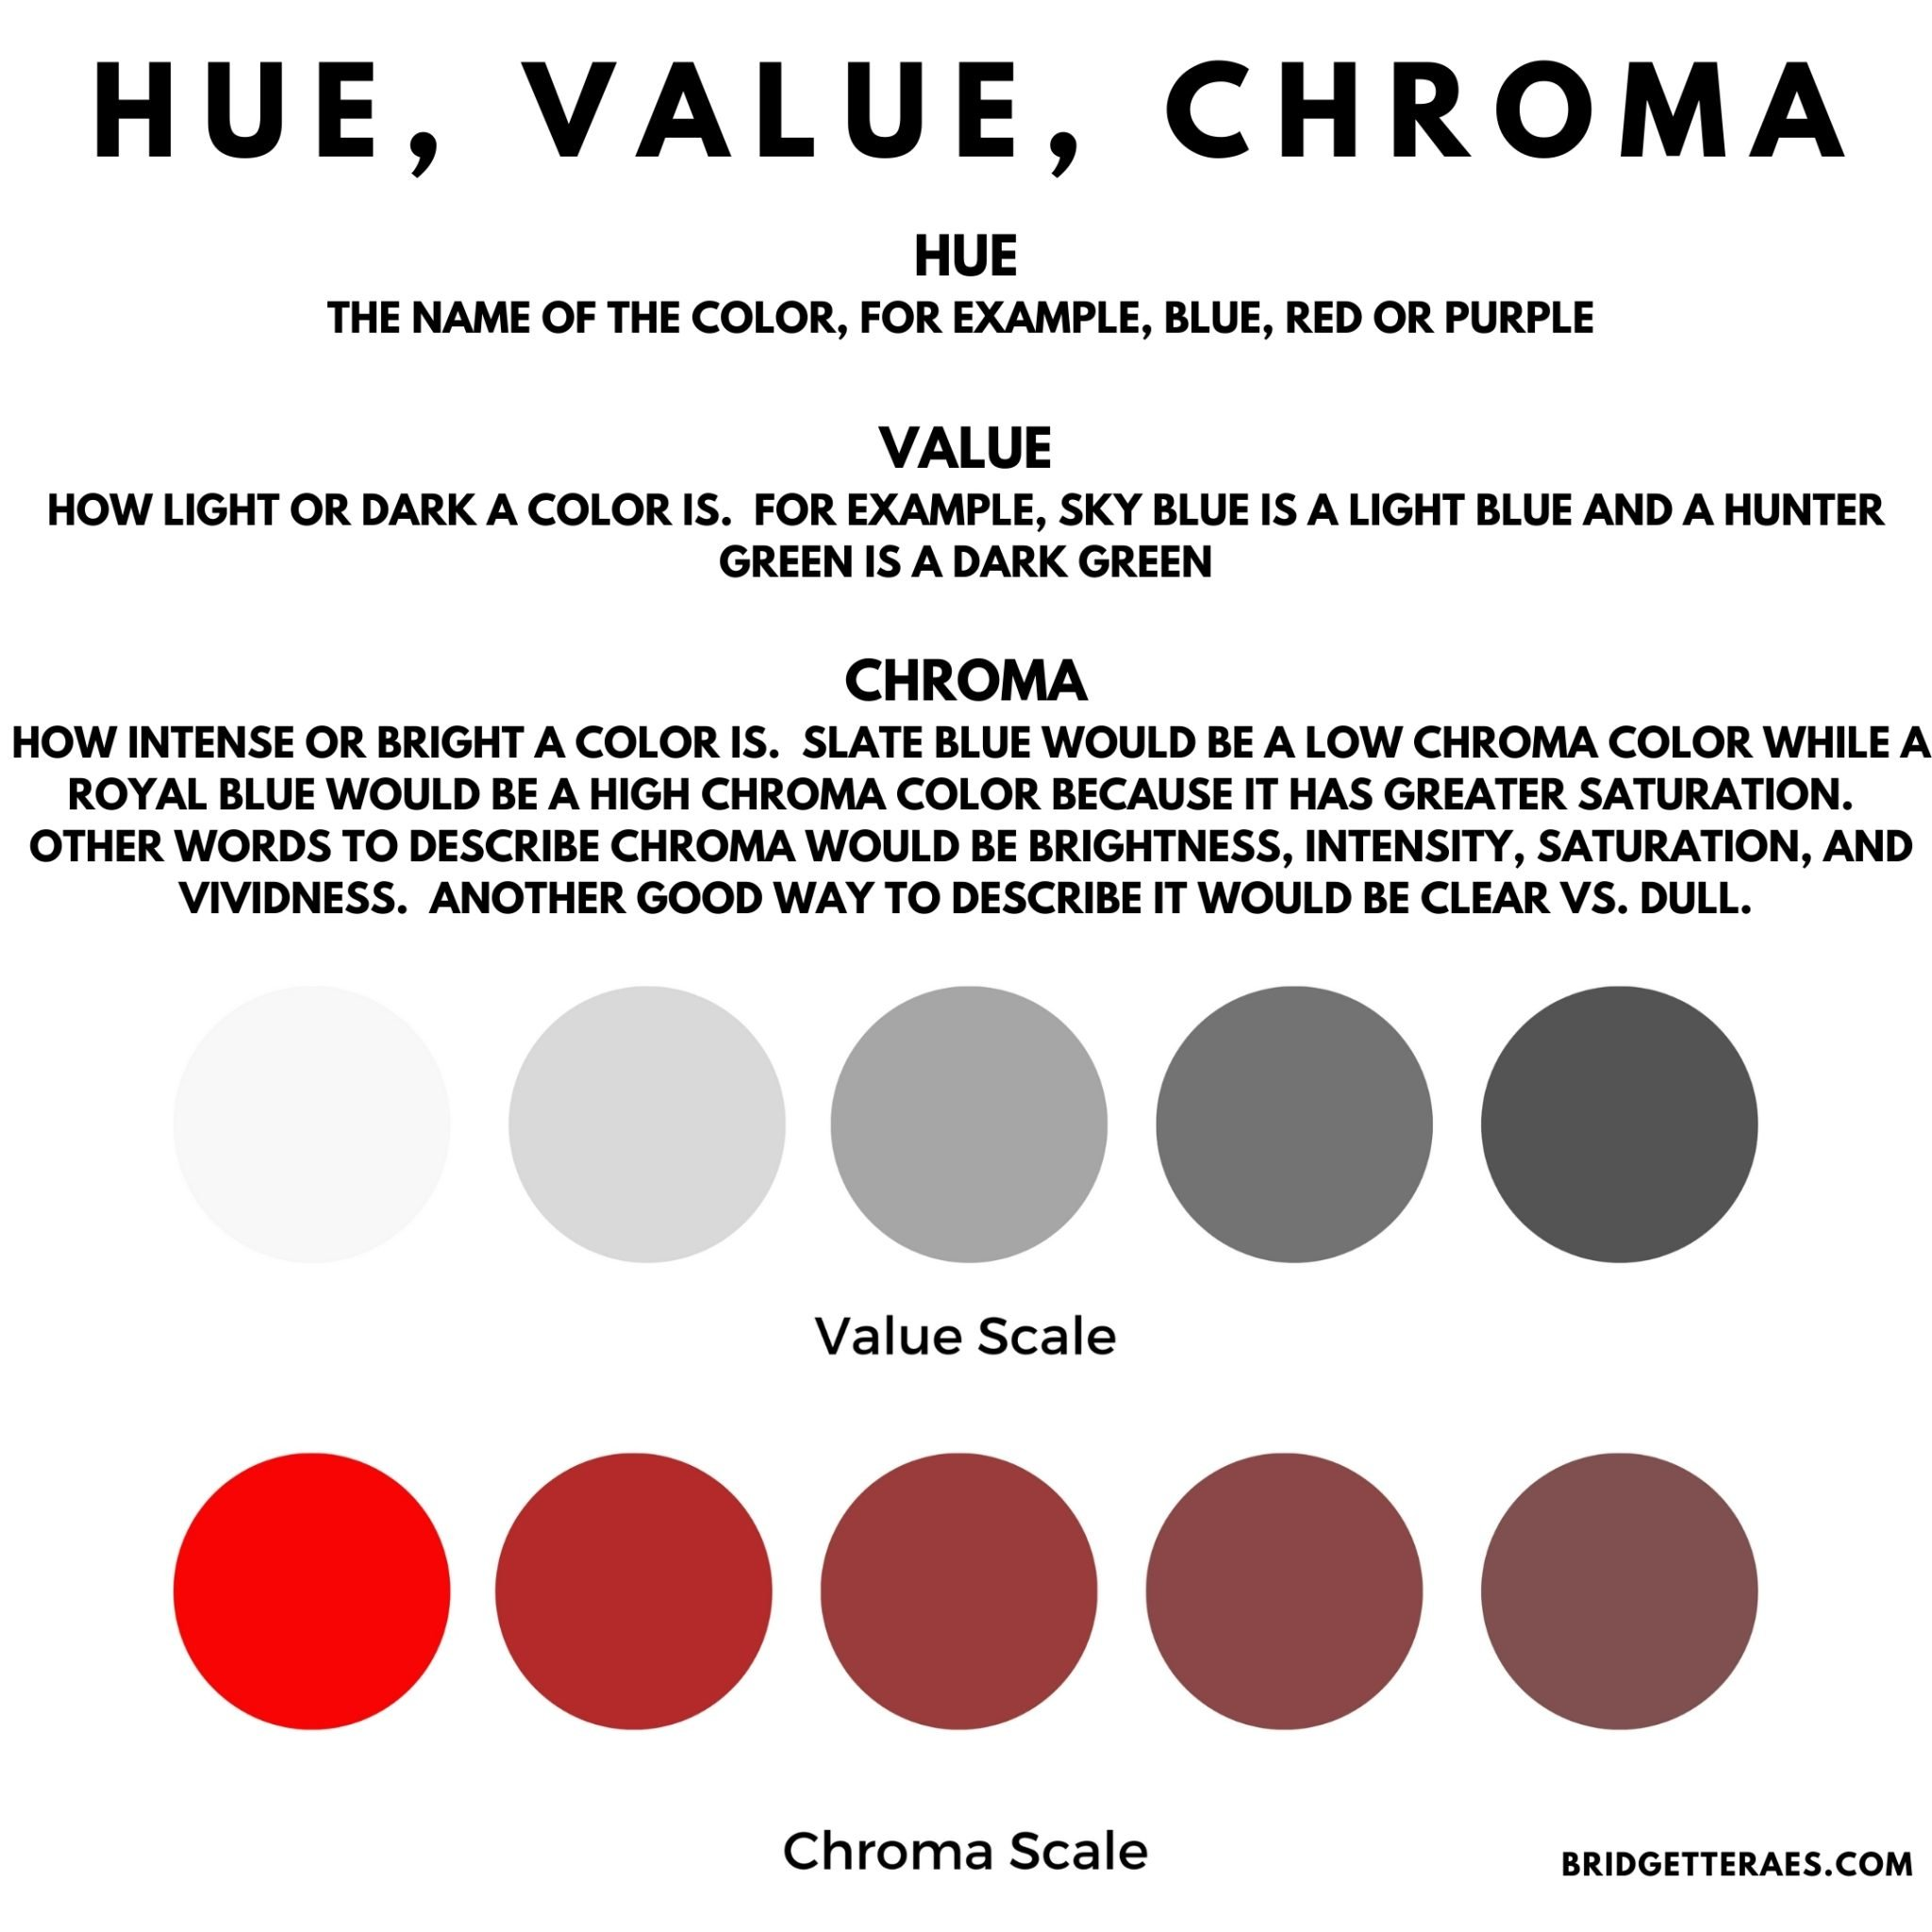 hue, value and chroma